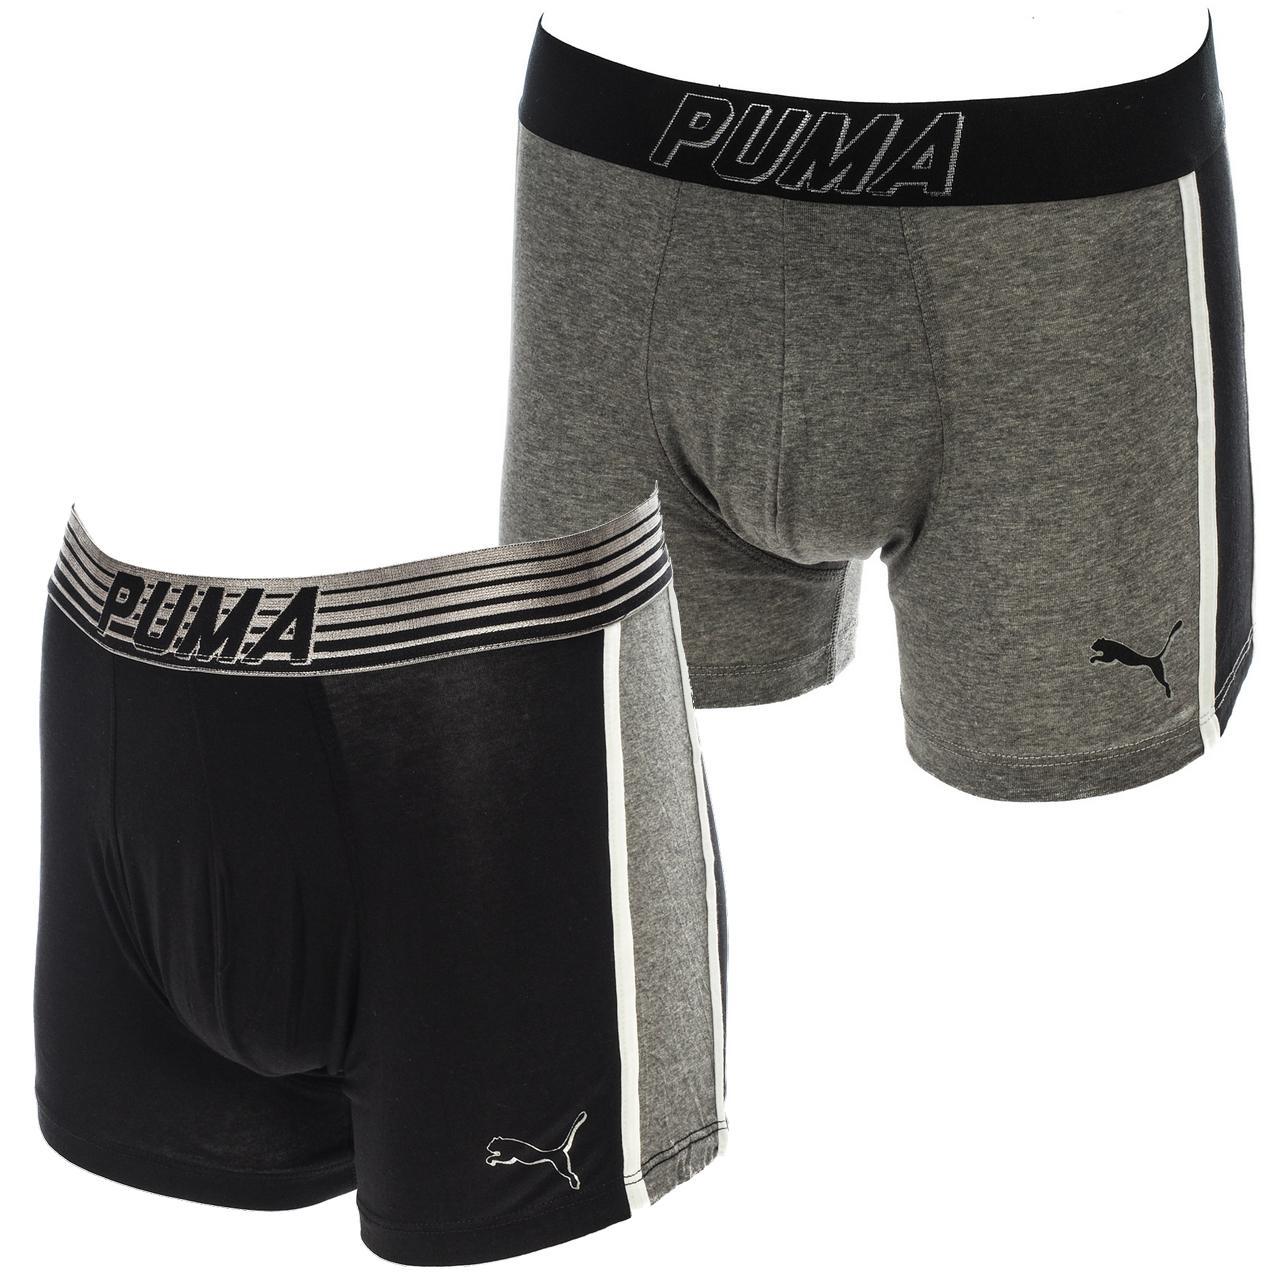 Underwear-Boxer-Puma-Bold-Blk-Groups-Boxer-x2-Assorted-18749-New